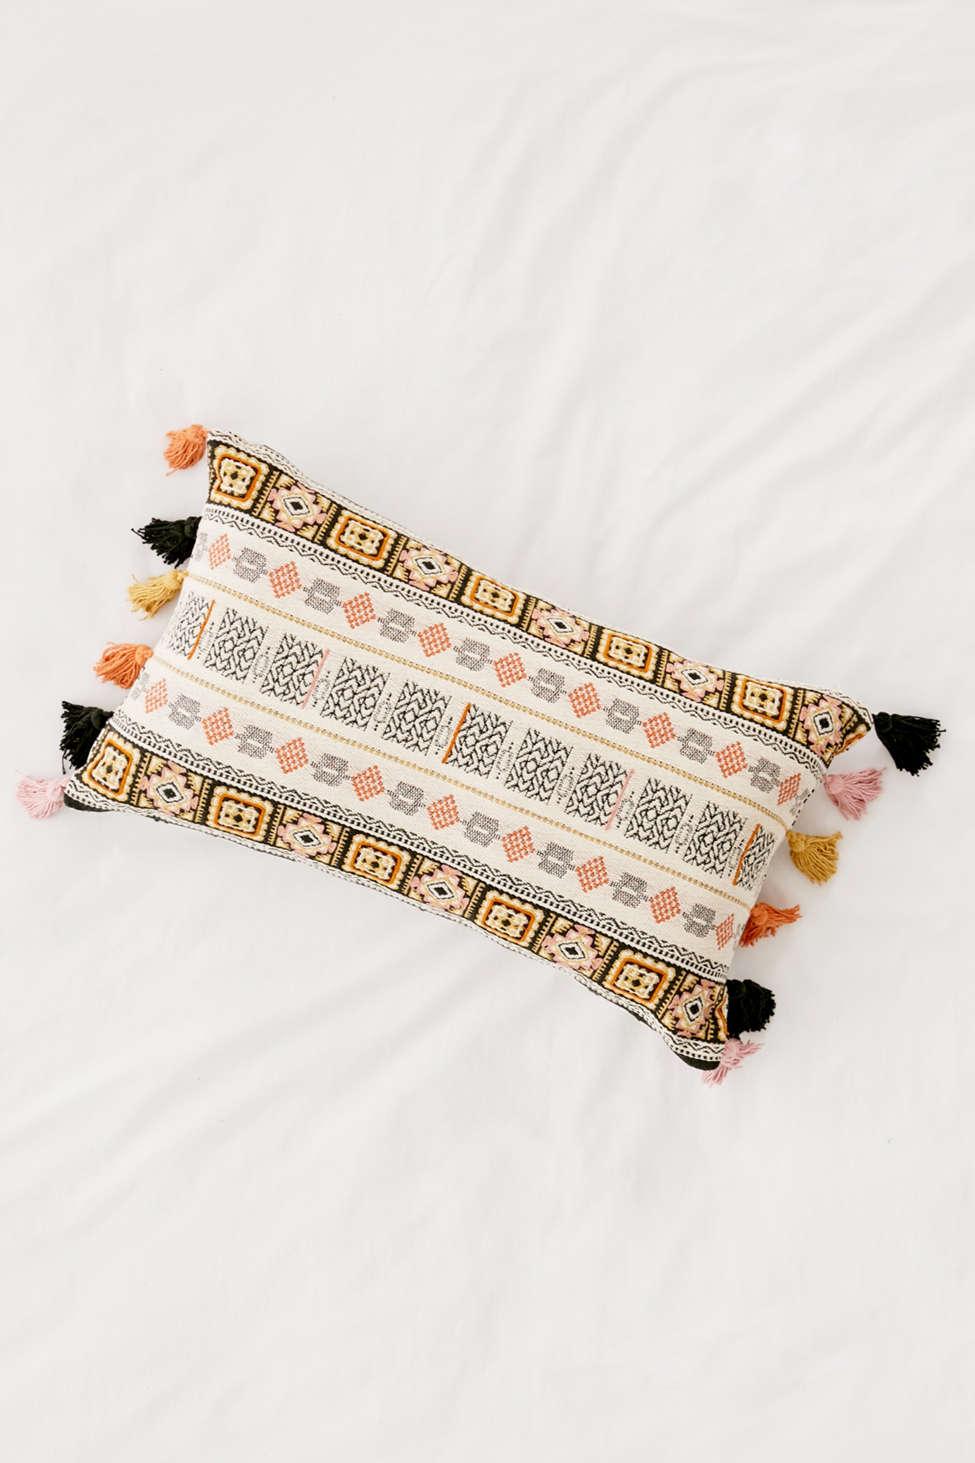 Slide View: 2: Harper Embroidered Bolster Pillow